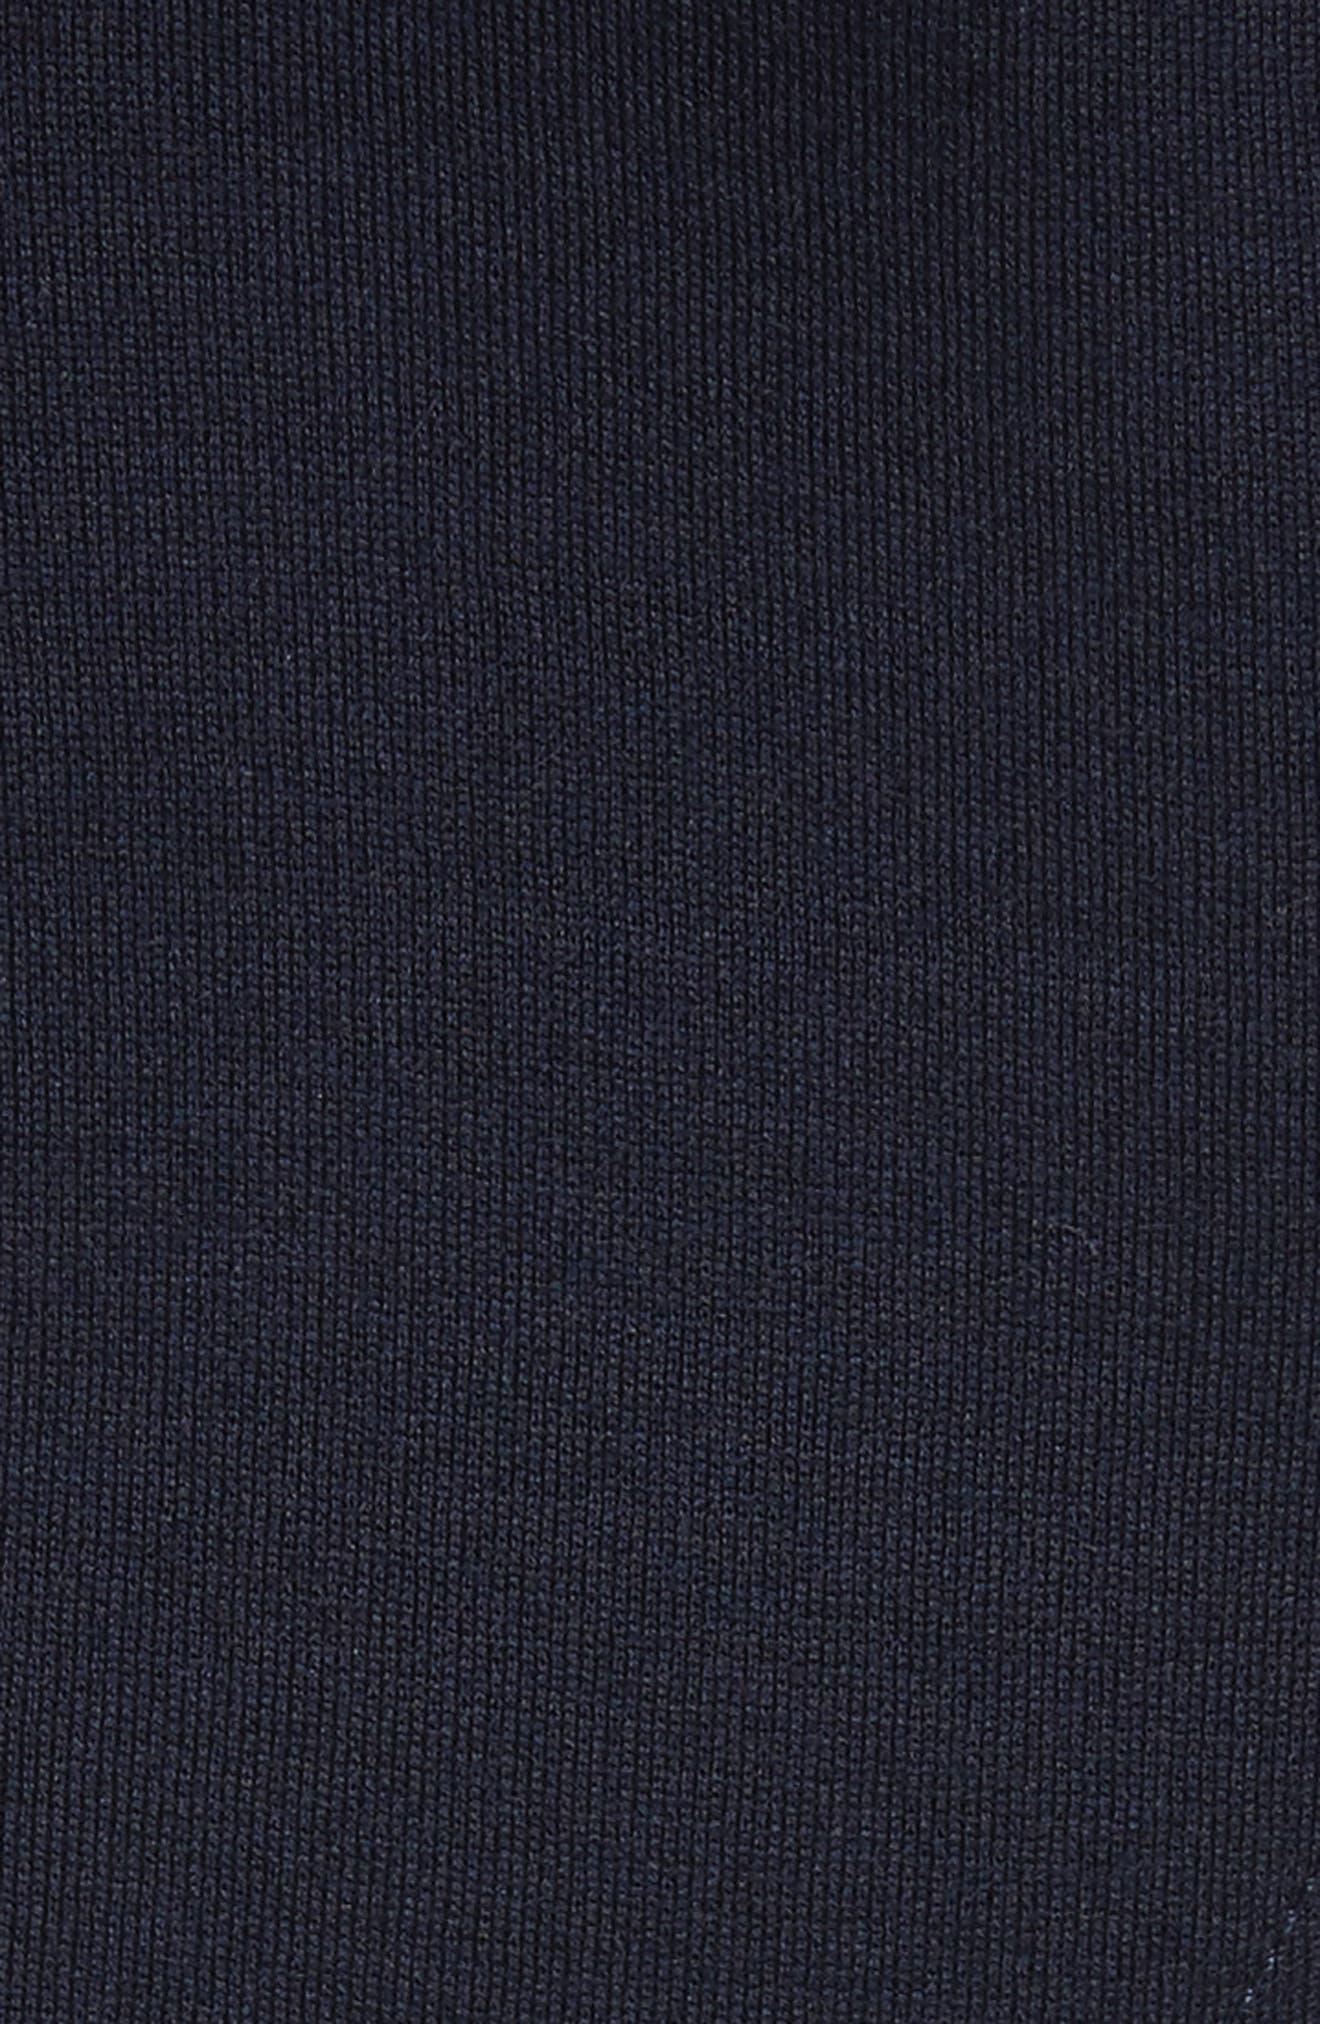 Milano Knit Dress,                             Alternate thumbnail 5, color,                             410